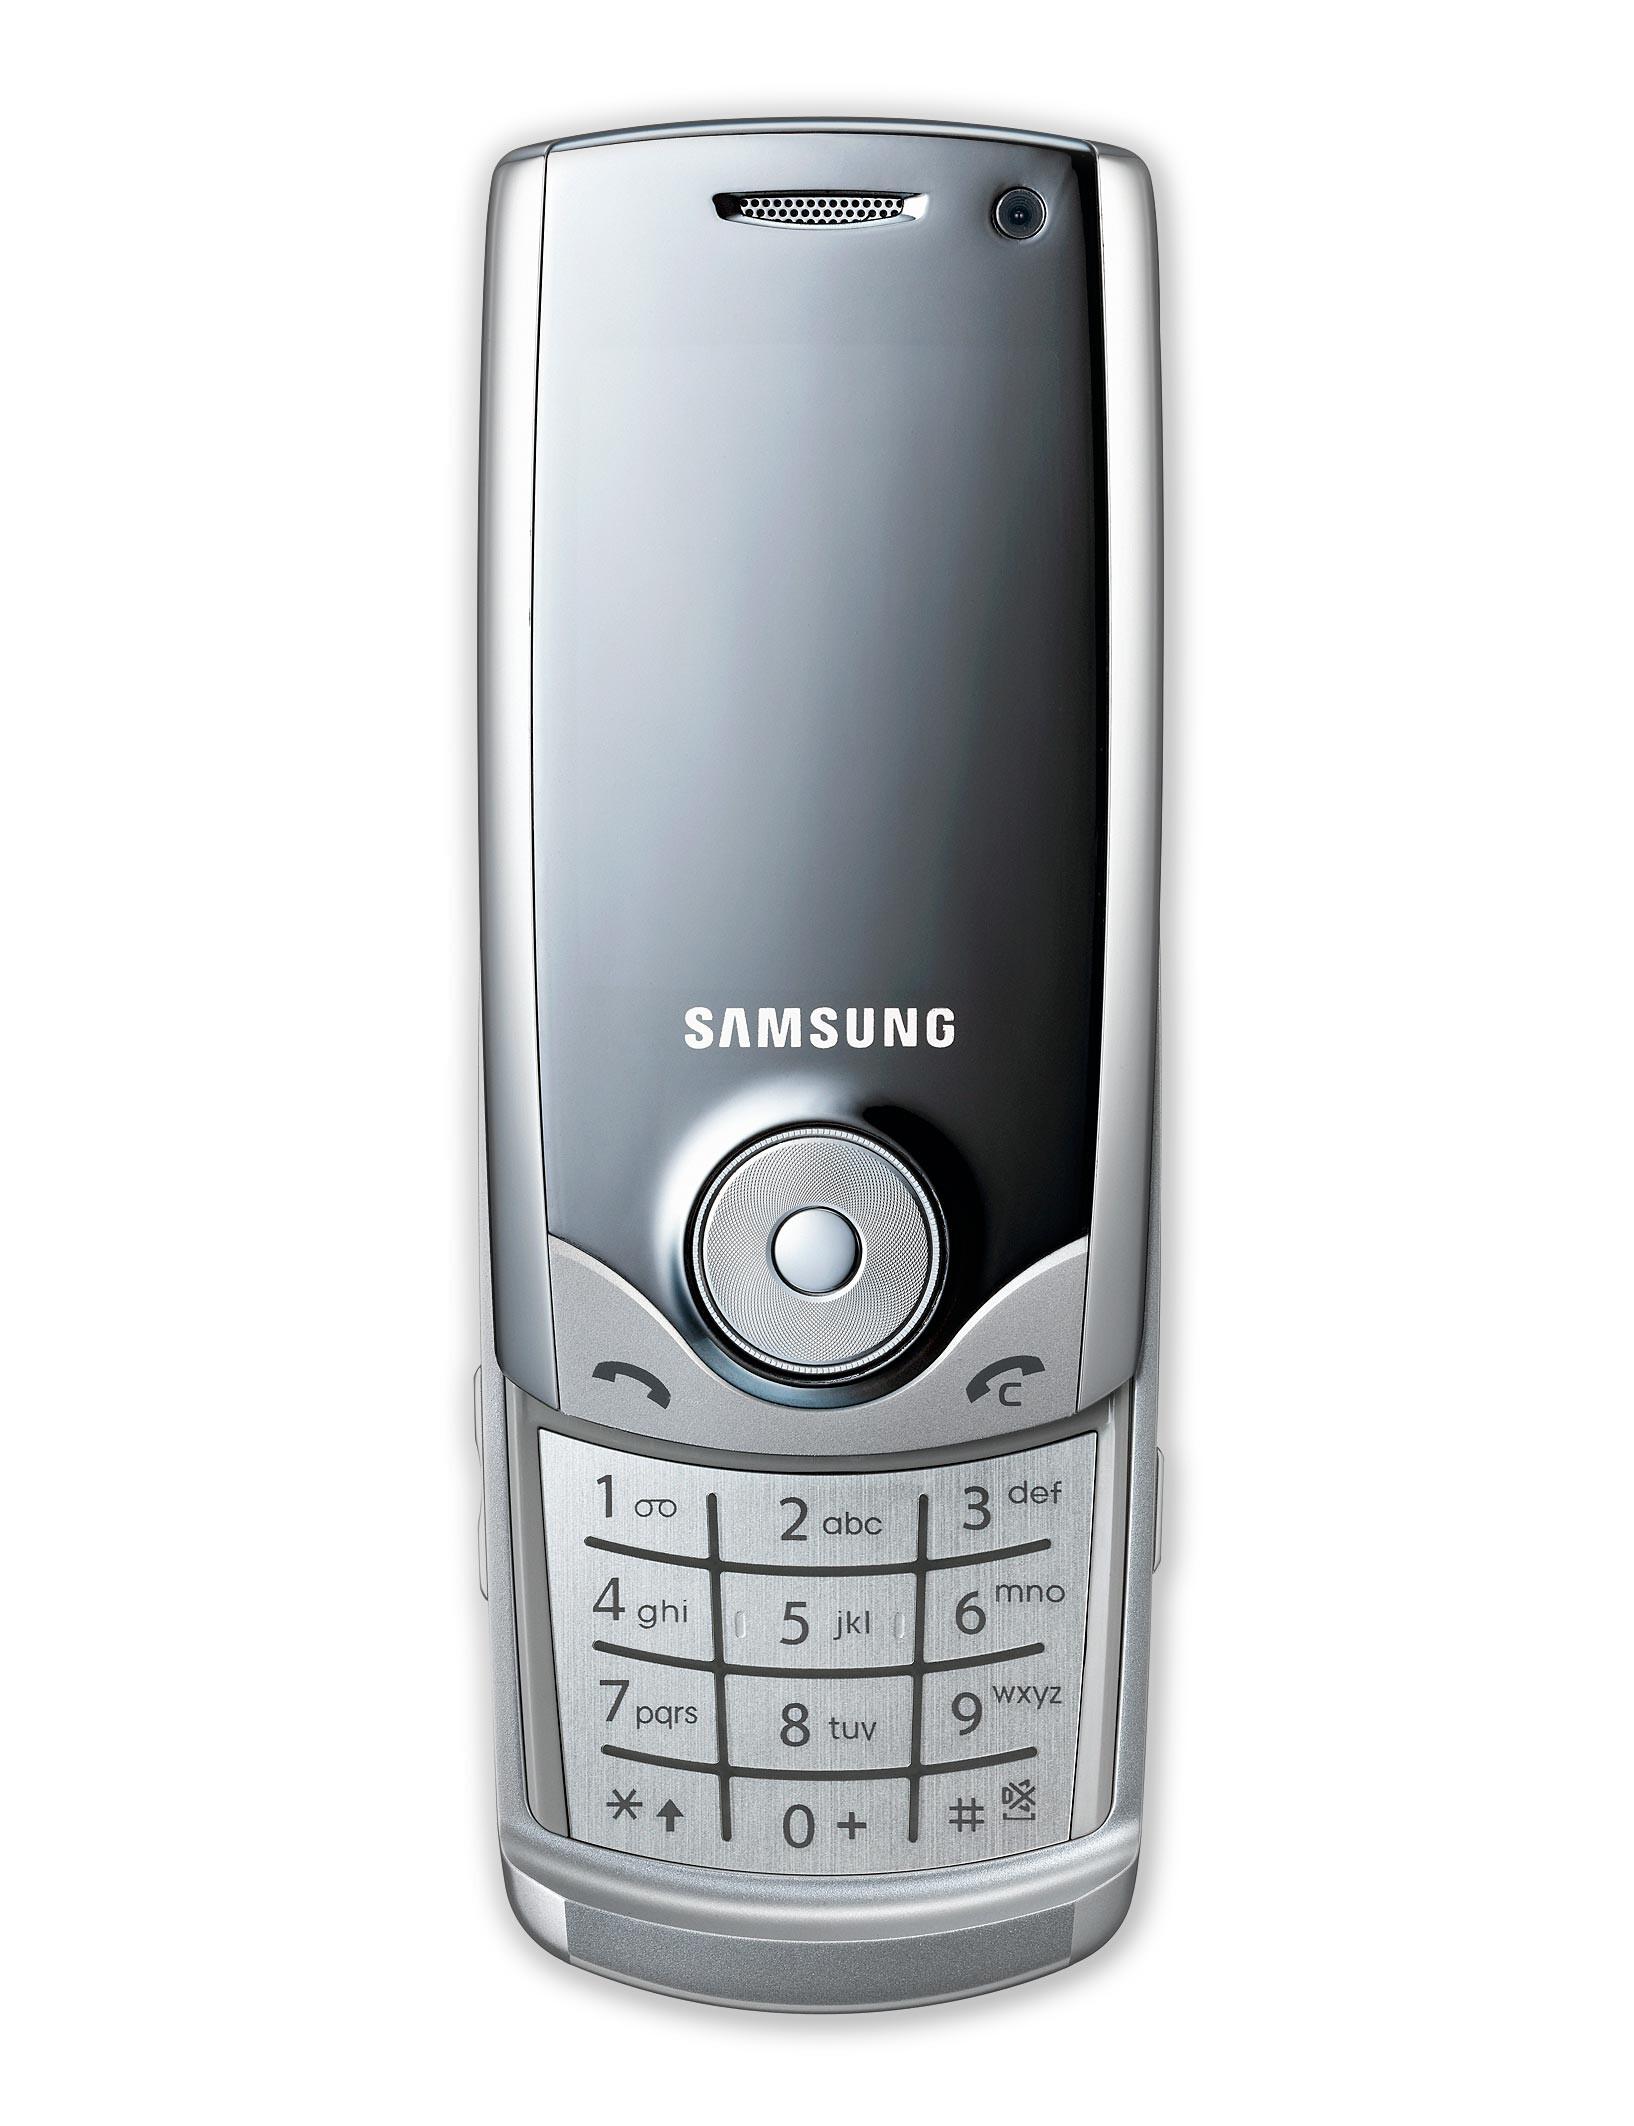 Samsung SGH-U700 Ultra 12.1 specs